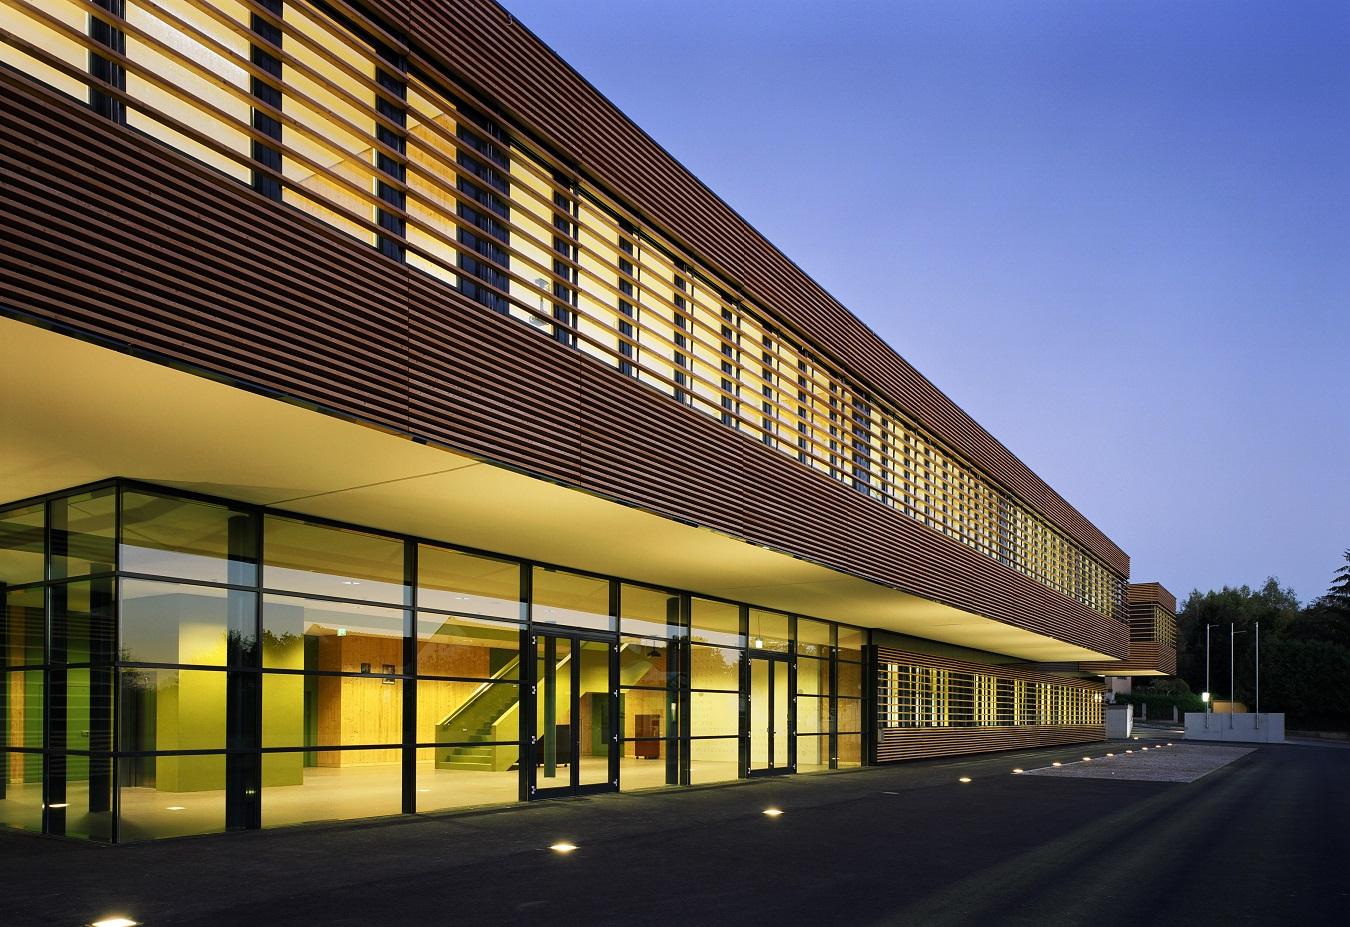 HTL Mistelbach Poppe*Prehal Architekten